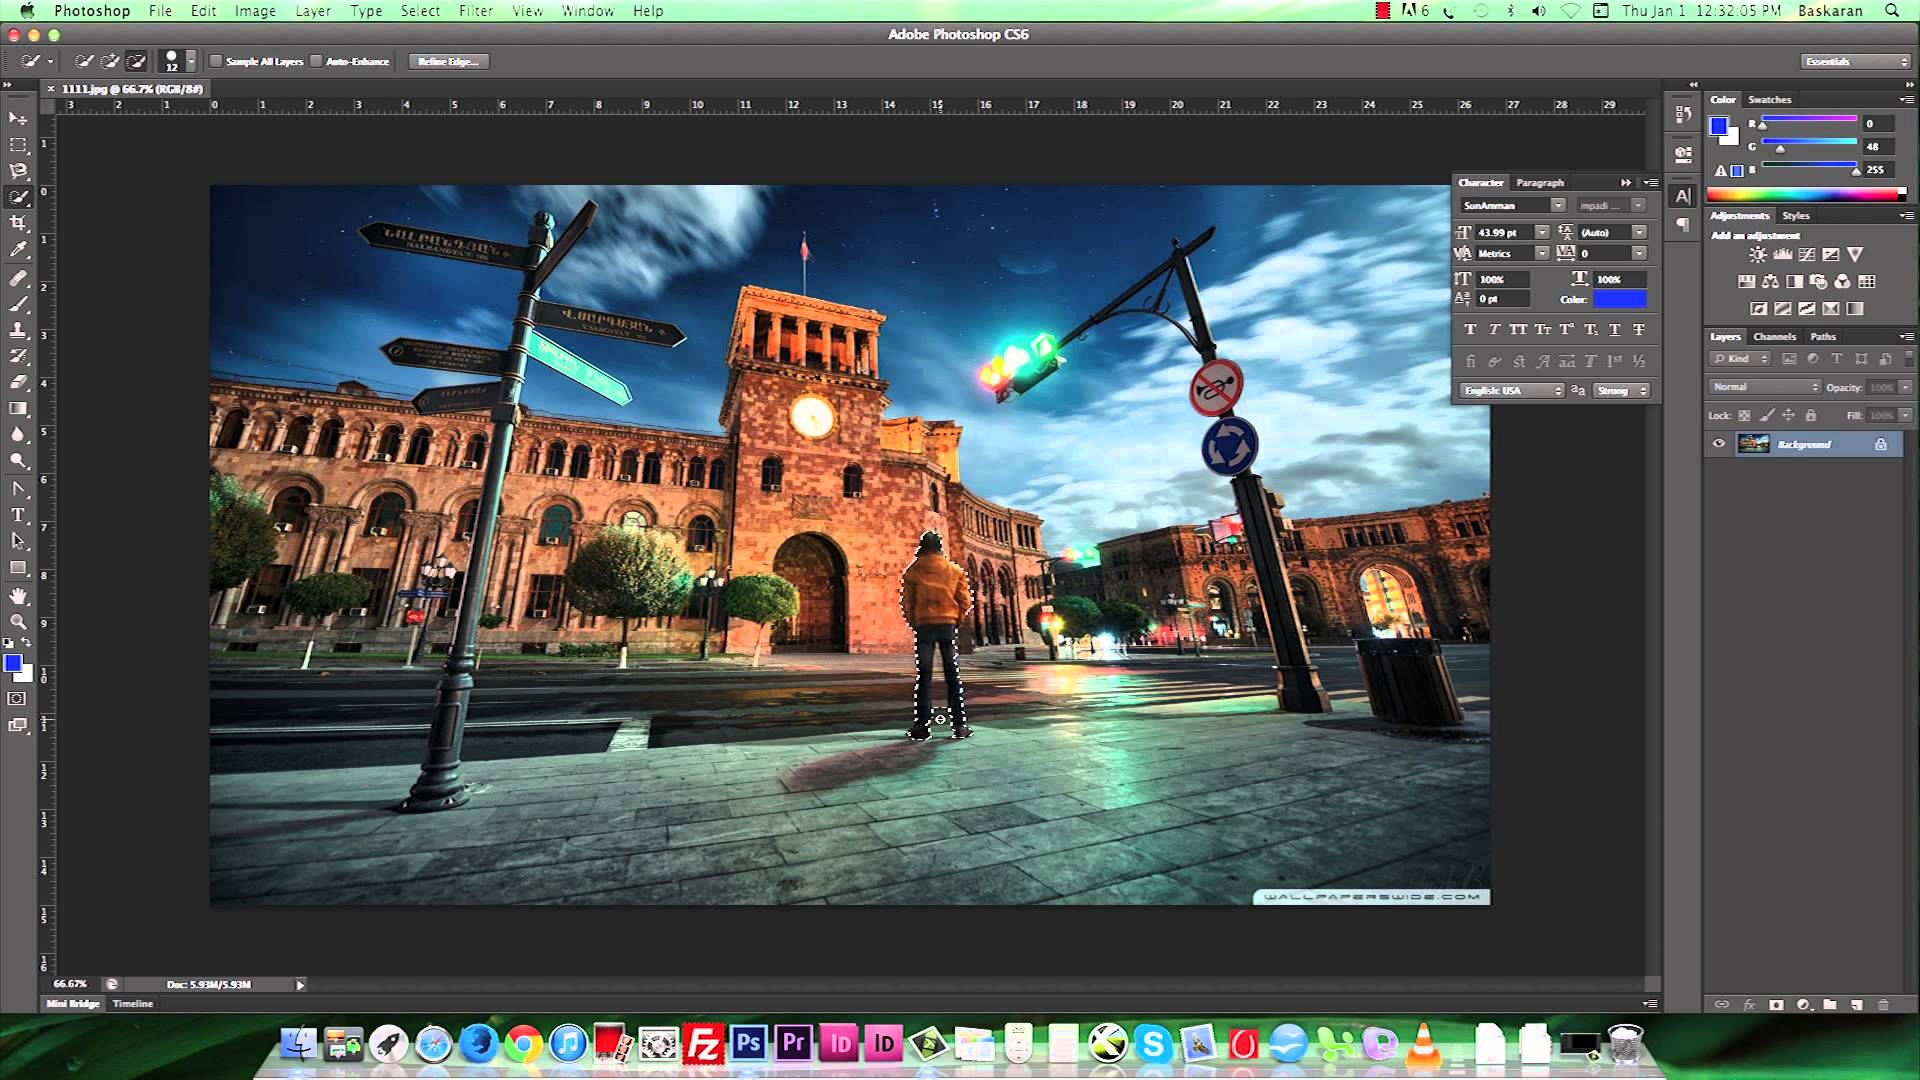 Adobe Photoshop CC 2019 Crack + License & Serial Key Free Download